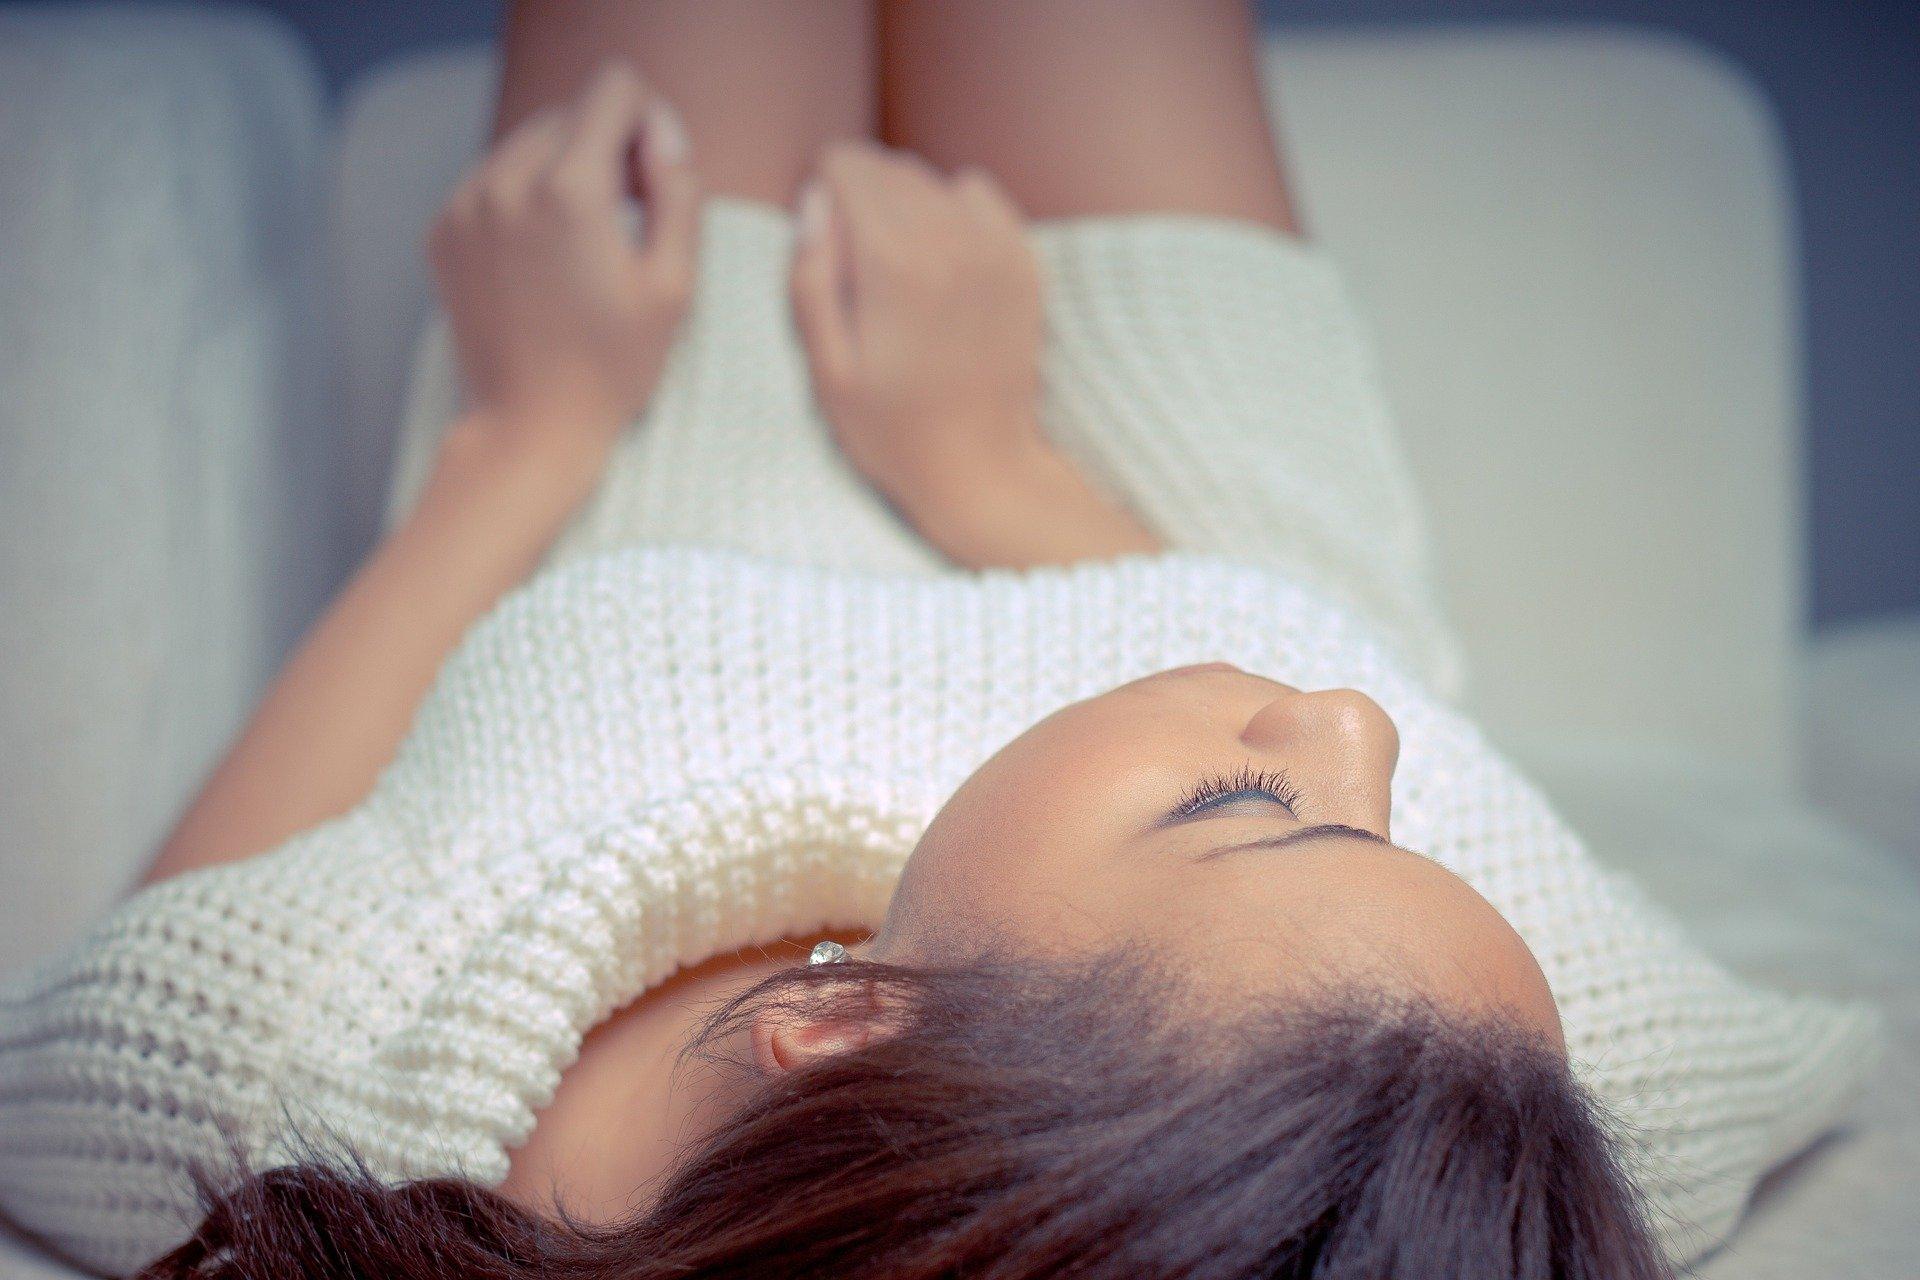 Ciclo mestruale e seno ingrossato